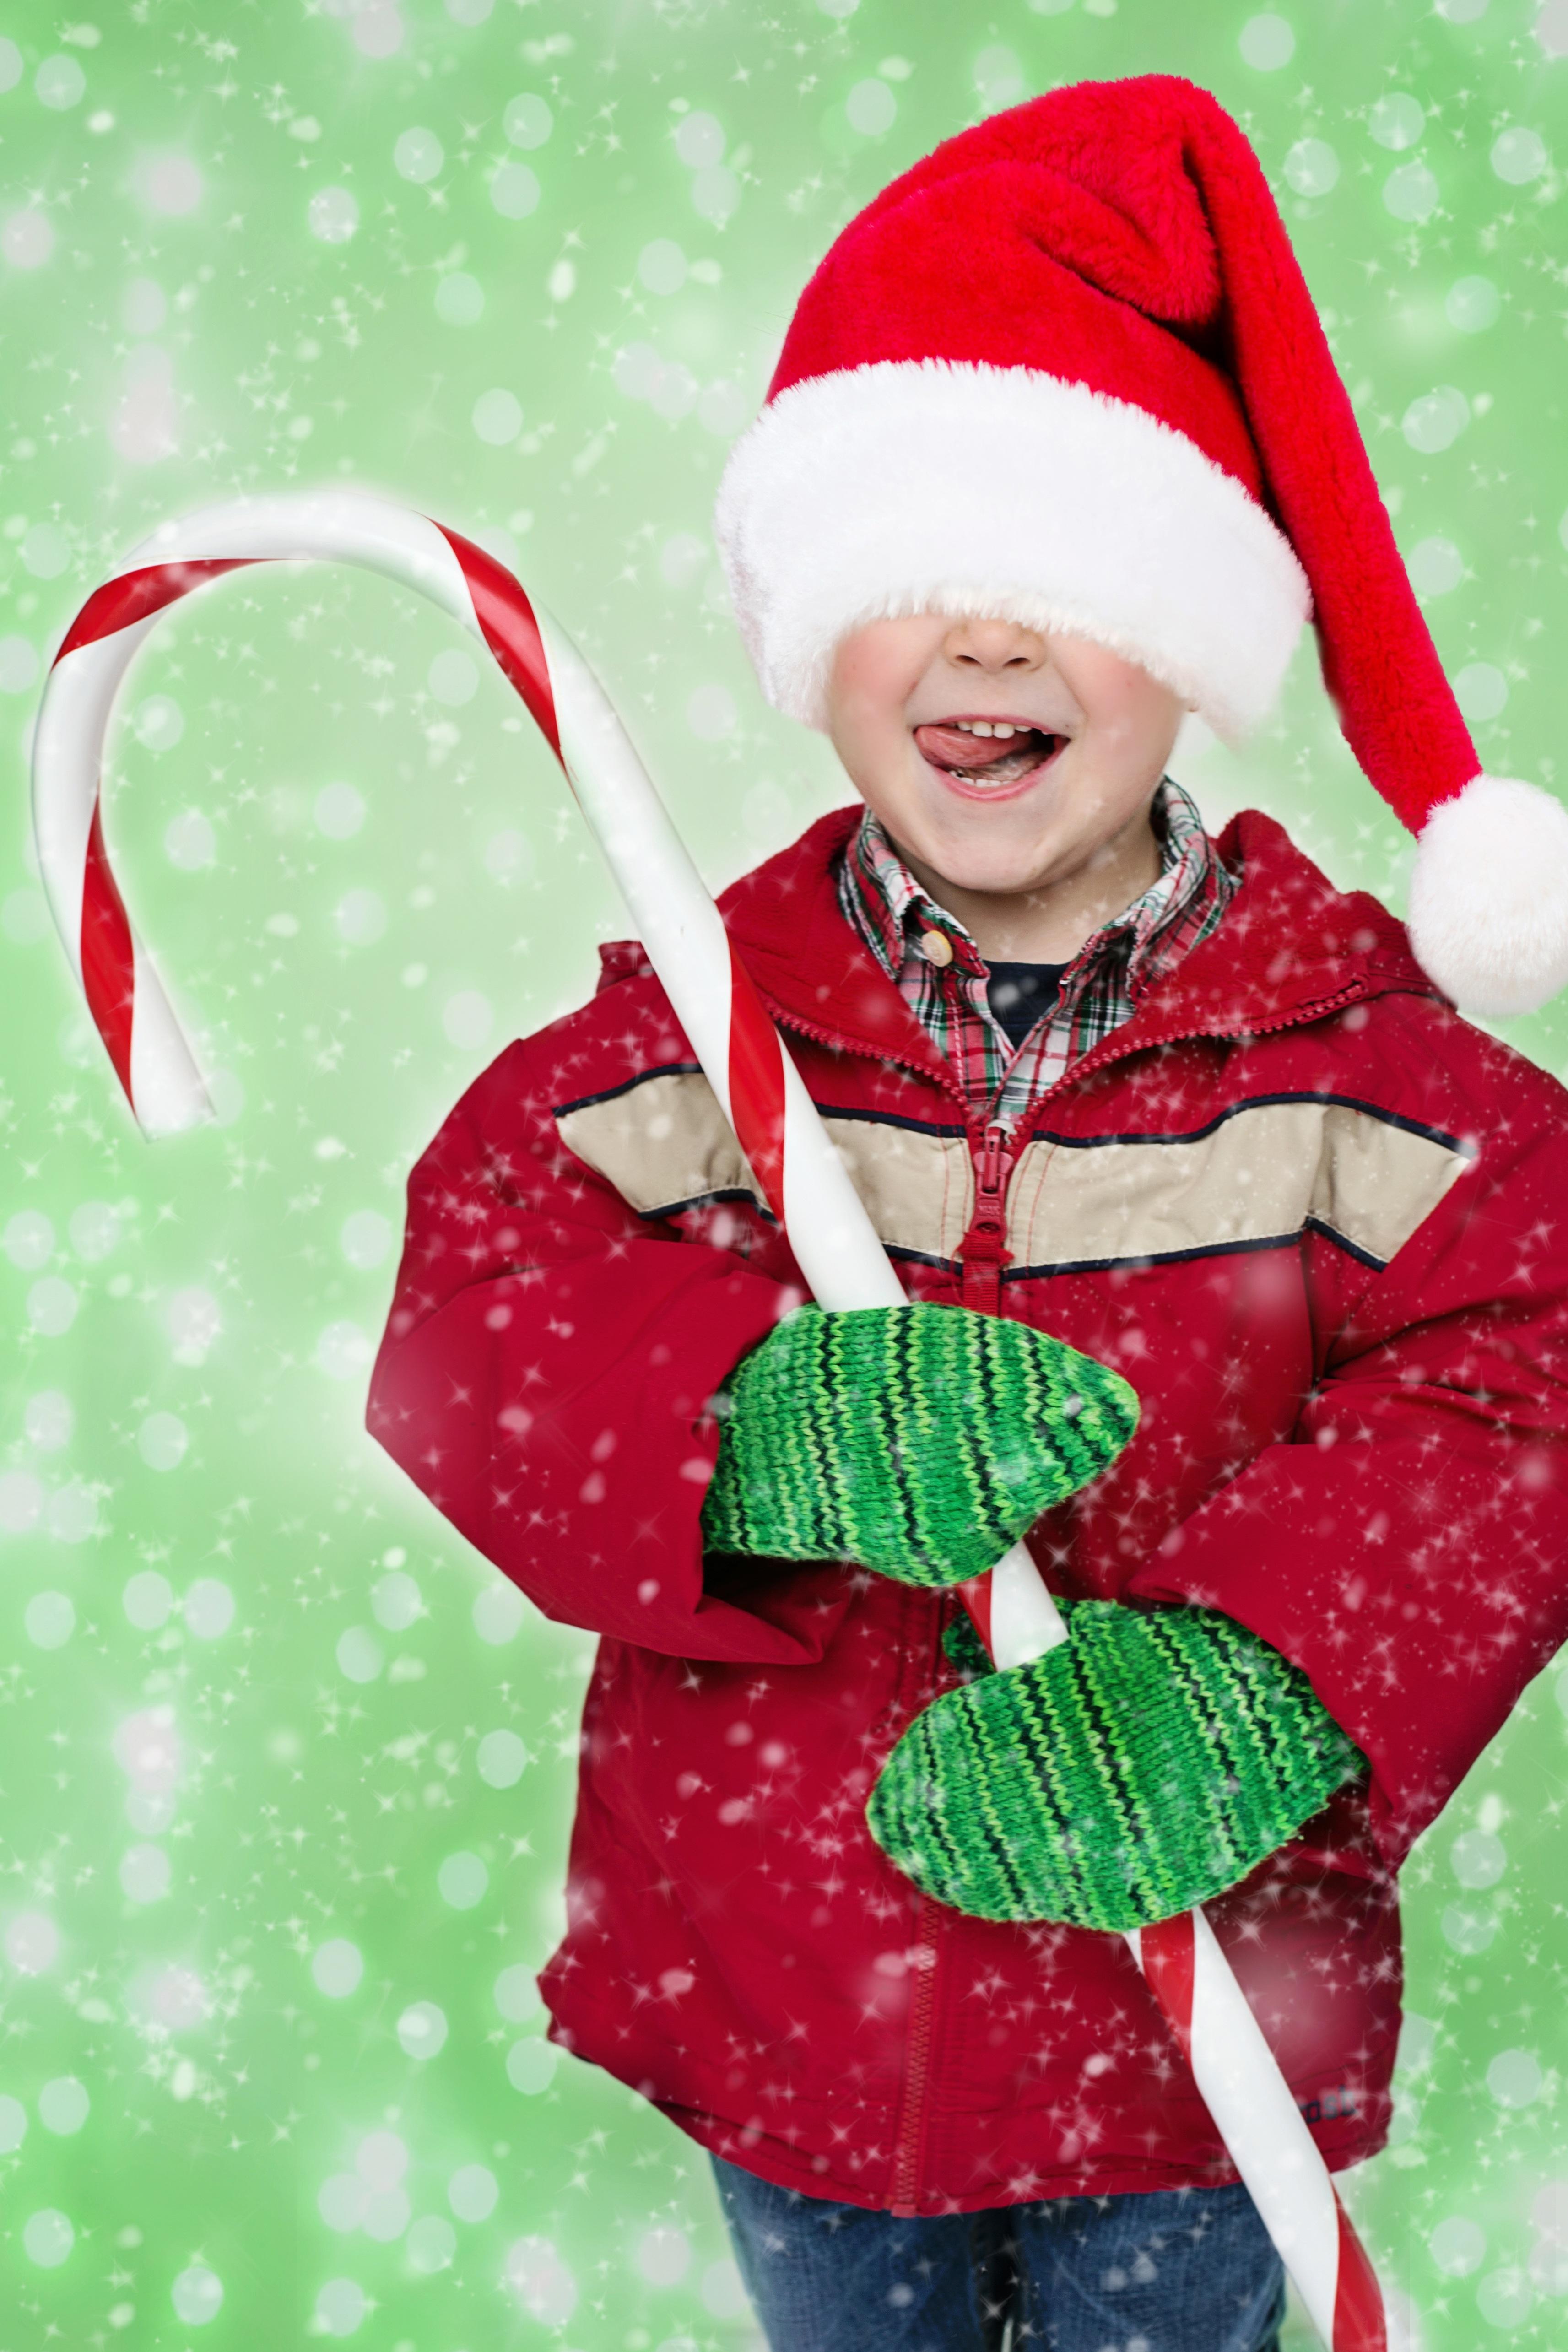 Free Images : holiday, child, season, happy, xmas, santa claus ...